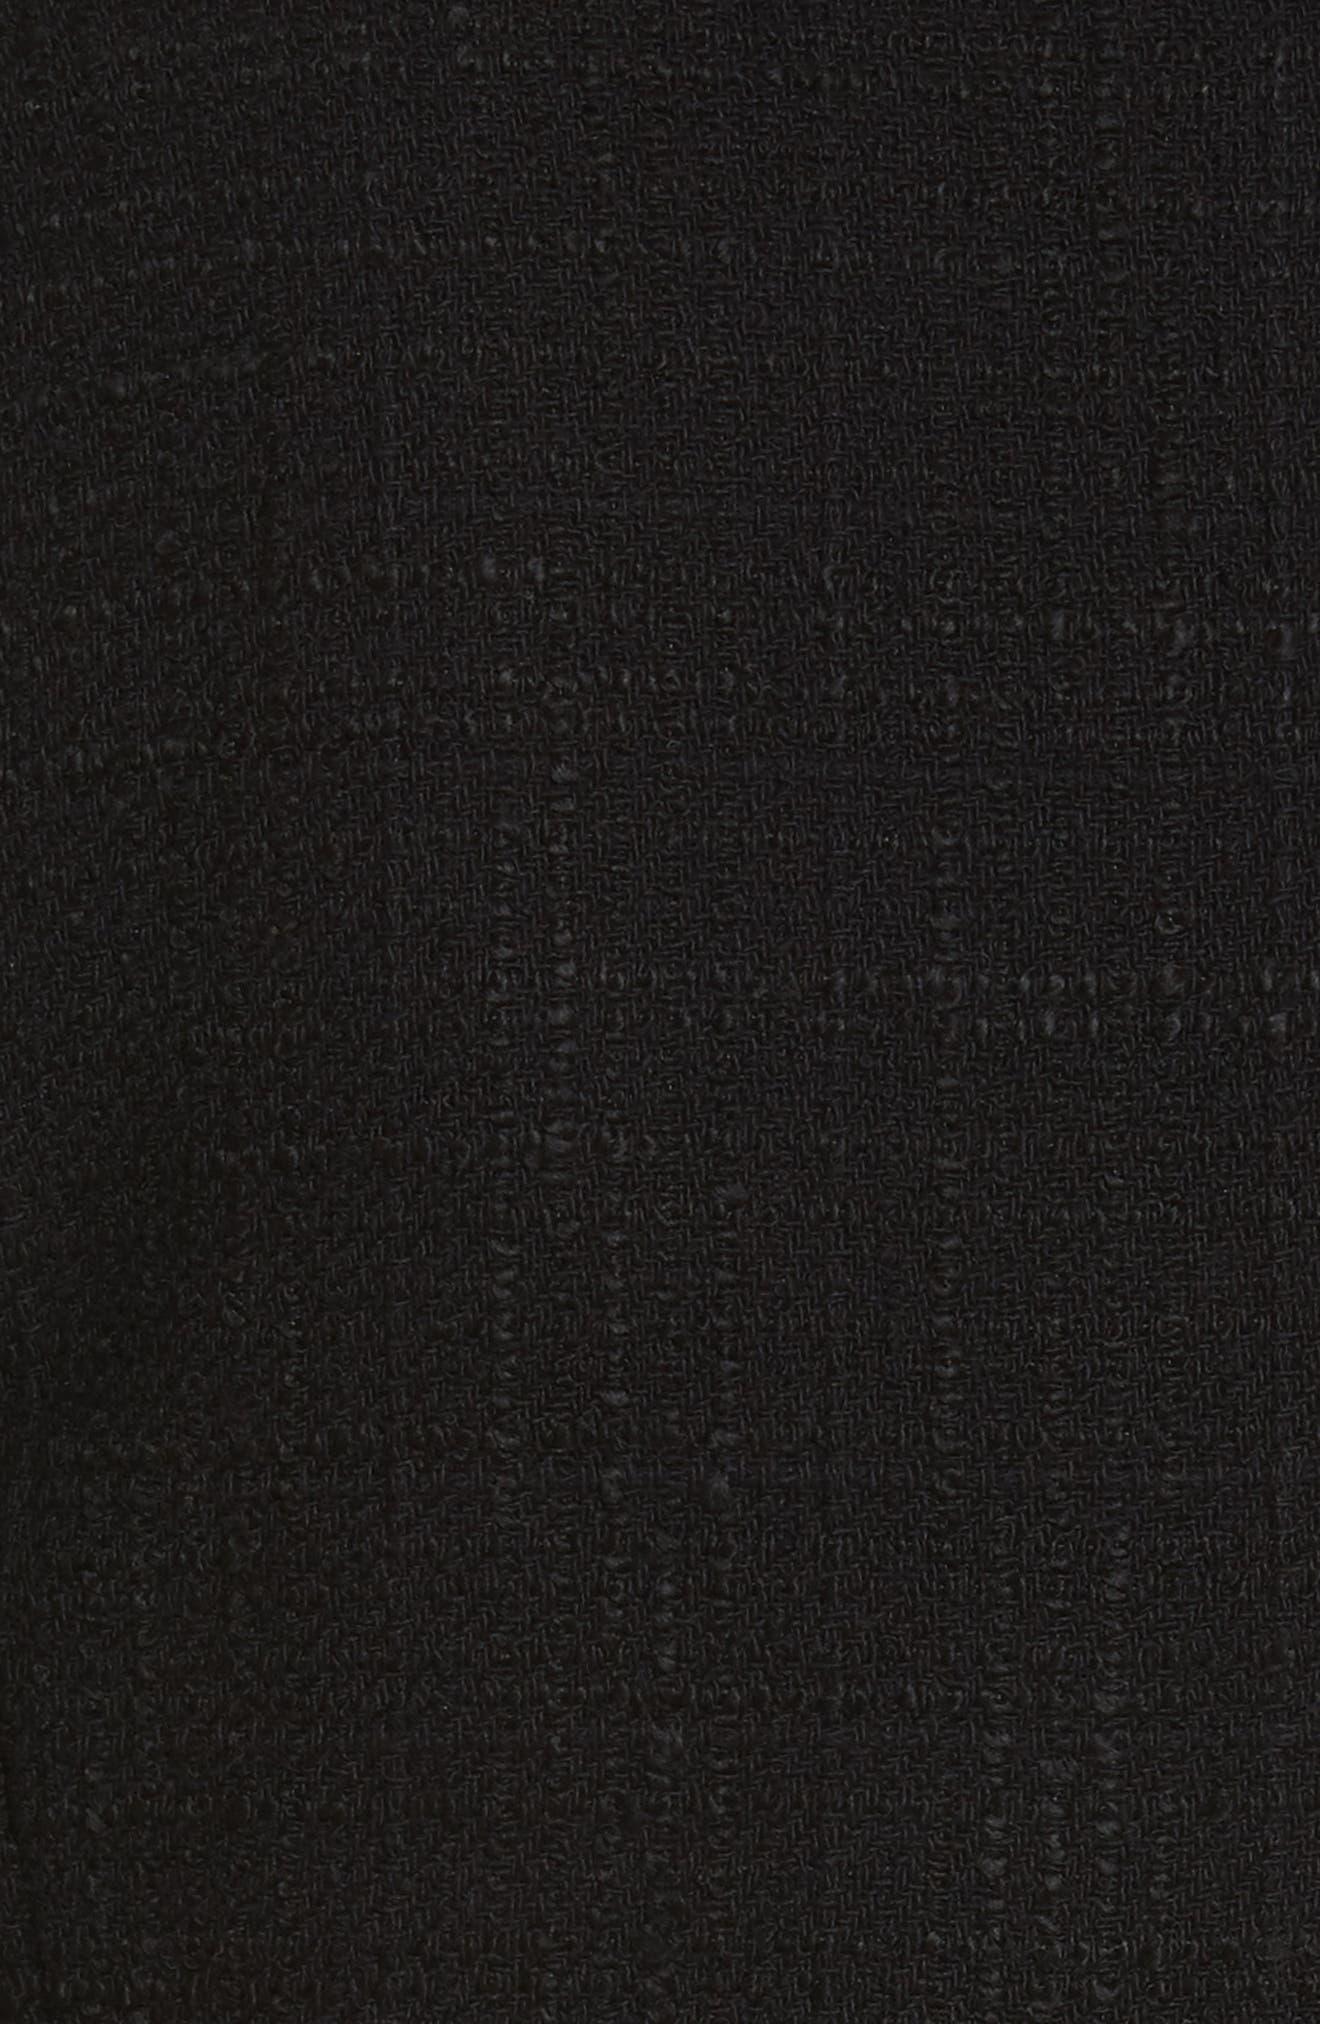 Textured Tweed Jacket,                             Alternate thumbnail 6, color,                             Black